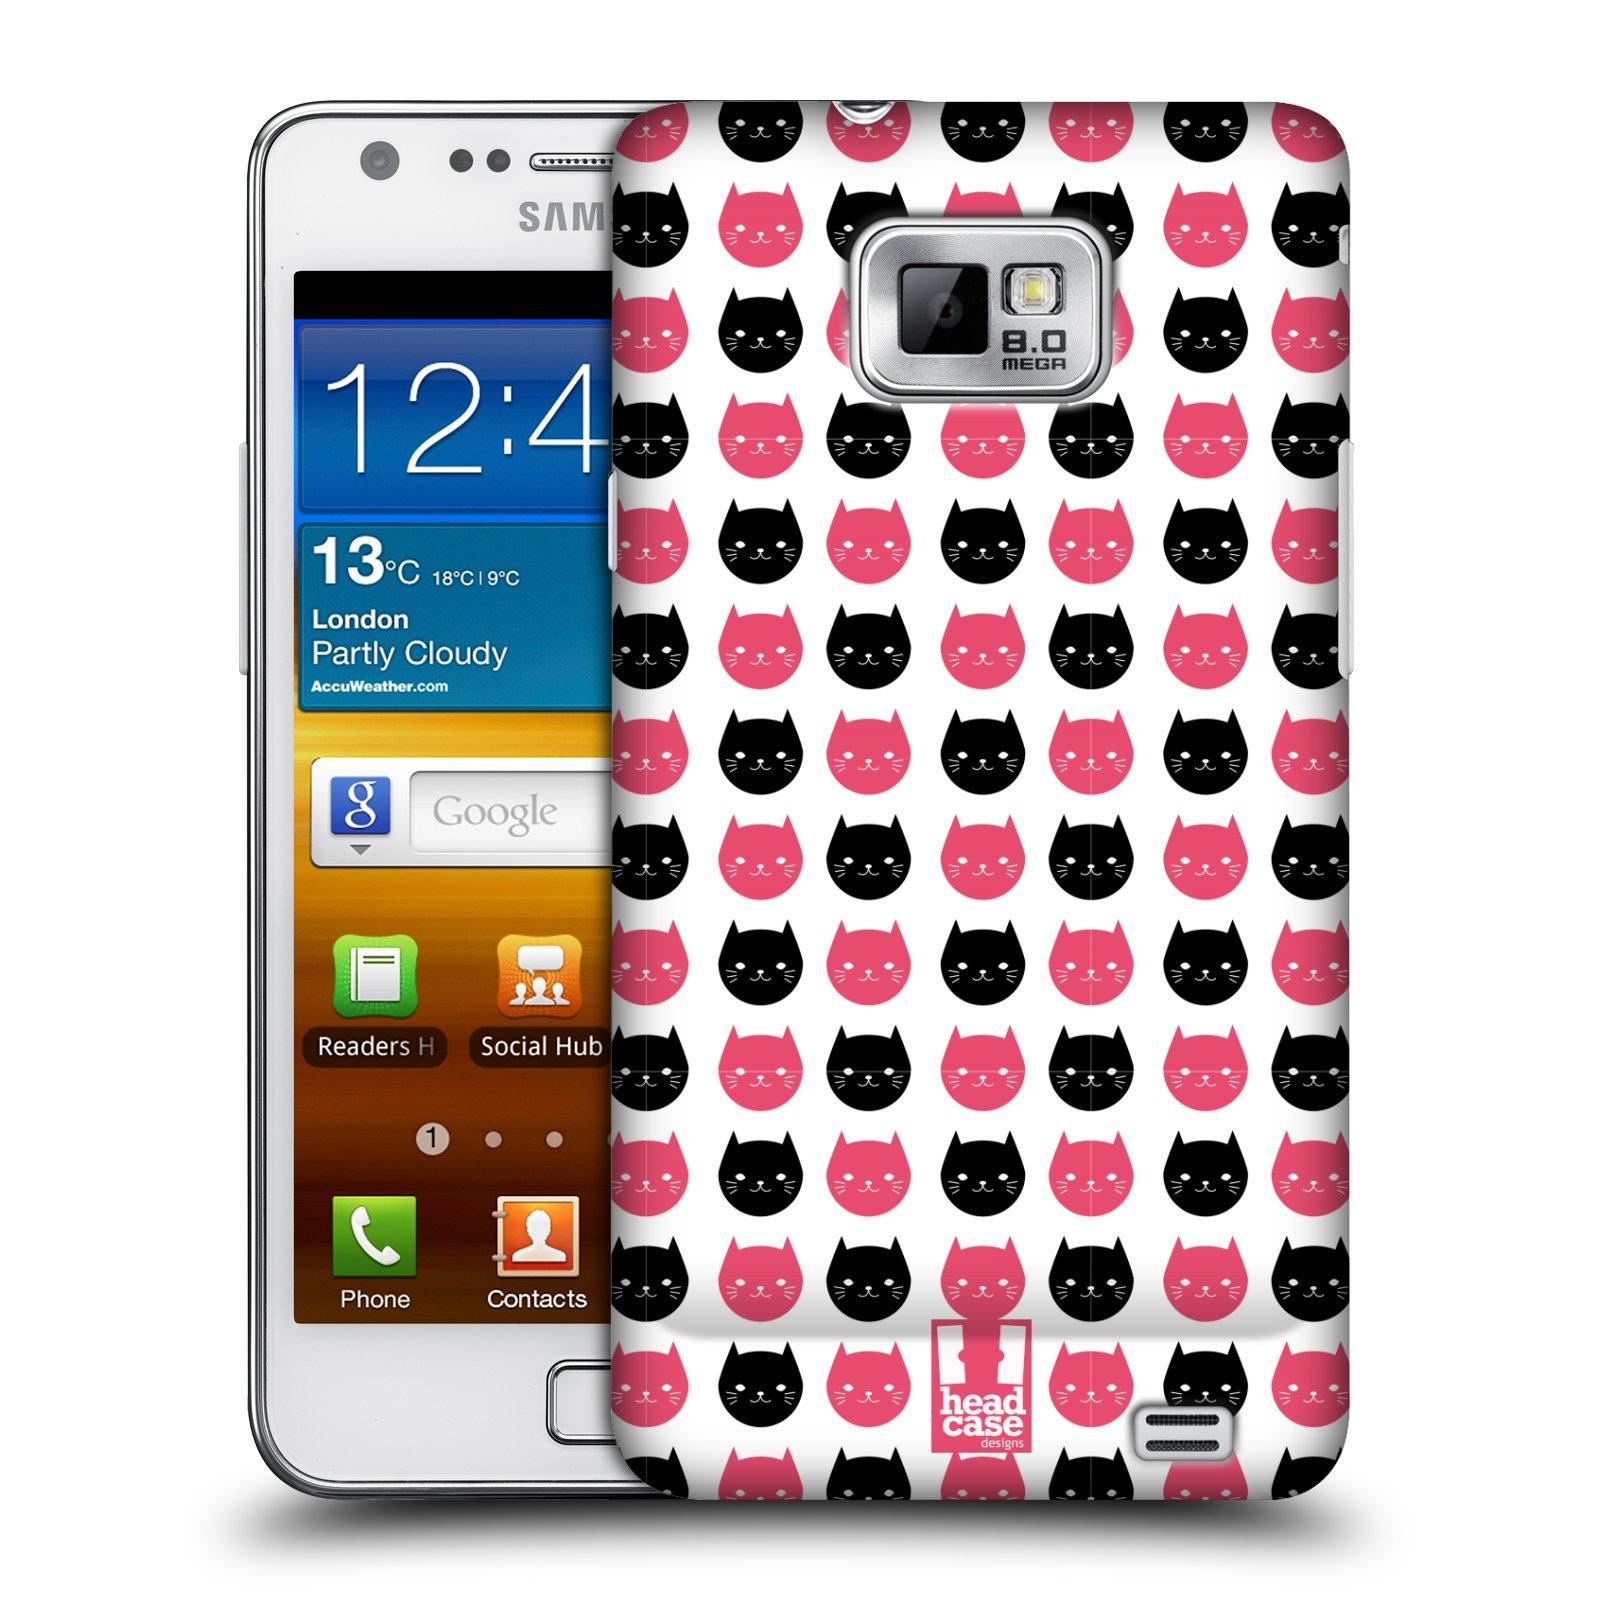 Plastové pouzdro na mobil Samsung Galaxy S II HEAD CASE KOČKY Black and Pink (Kryt či obal na mobilní telefon Samsung Galaxy S II GT-i9100)